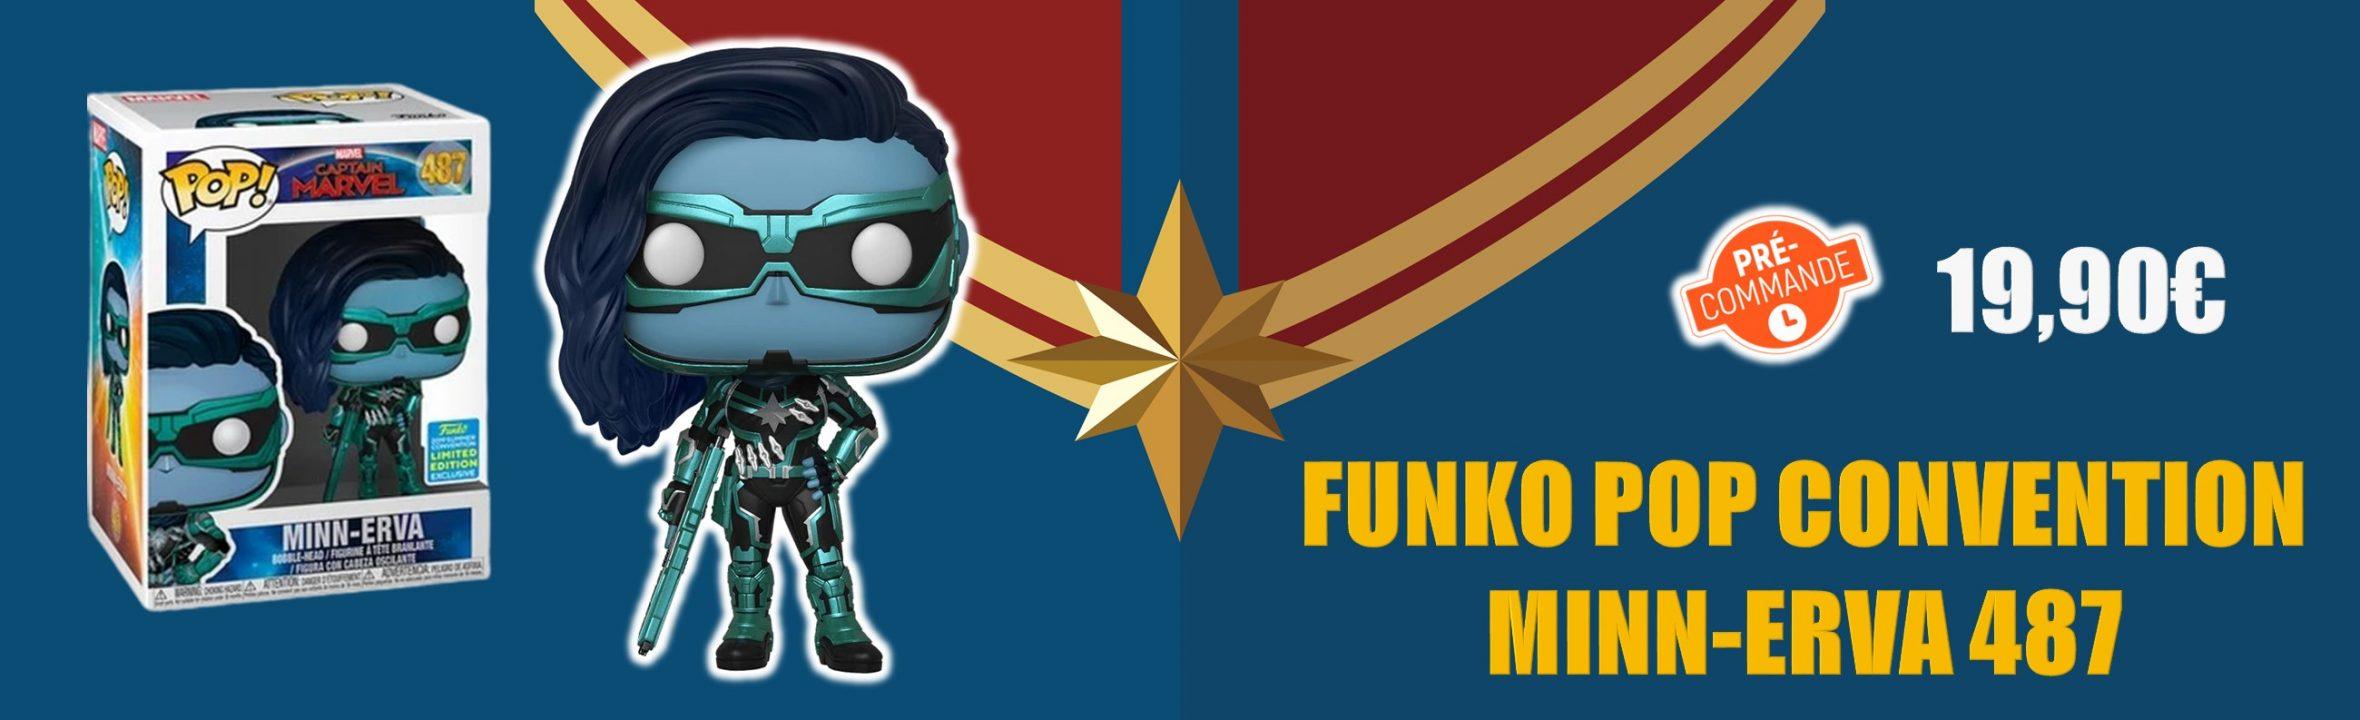 figurine funko pop Minn-erva 487 convention captain marvel goodin shop